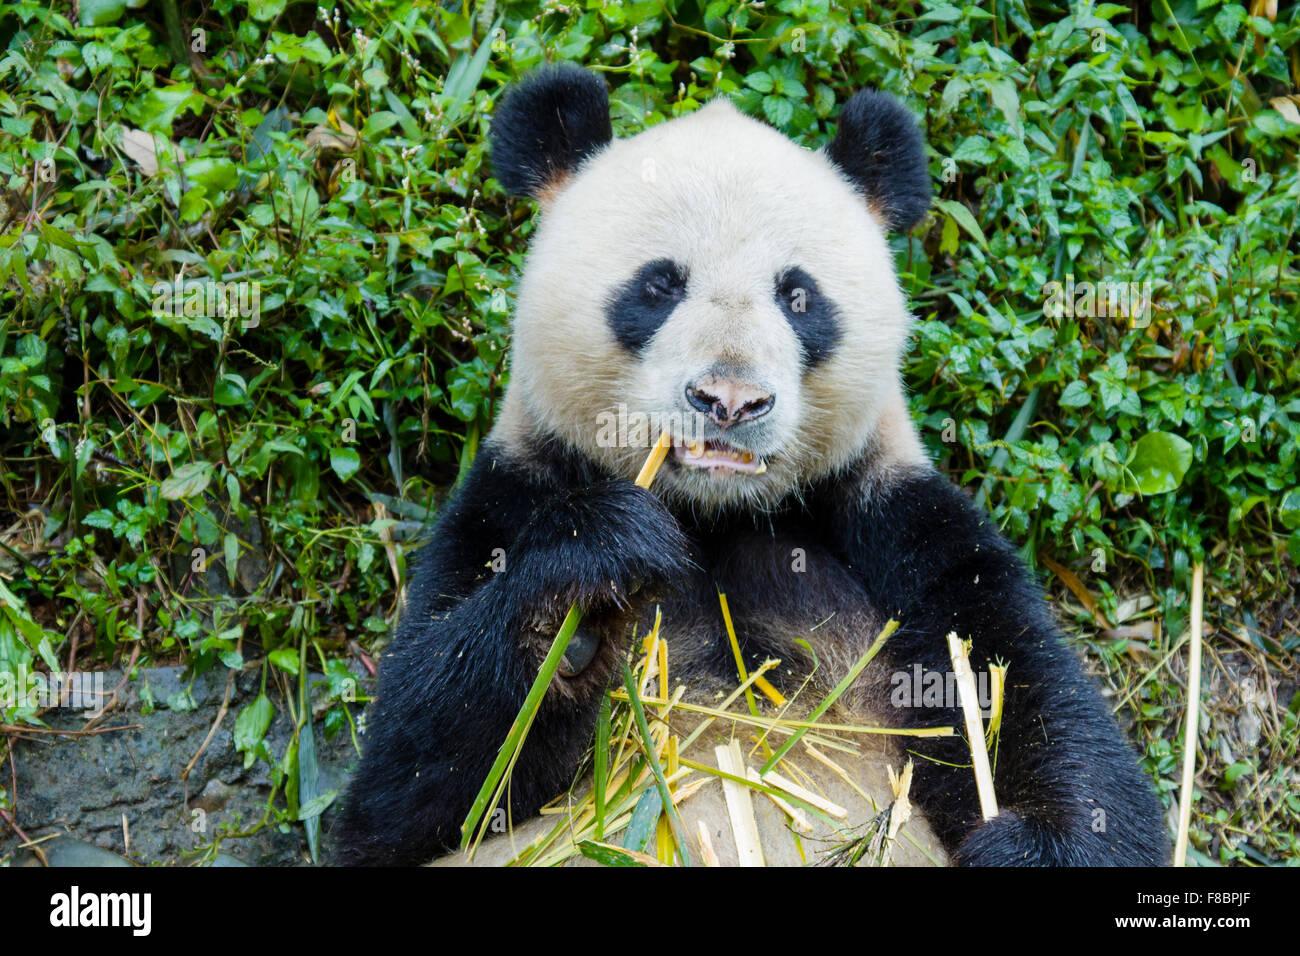 Panda Ailuropoda melanoleuca Bifengxia Panda Base Sichuan Province China MA003070 - Stock Image